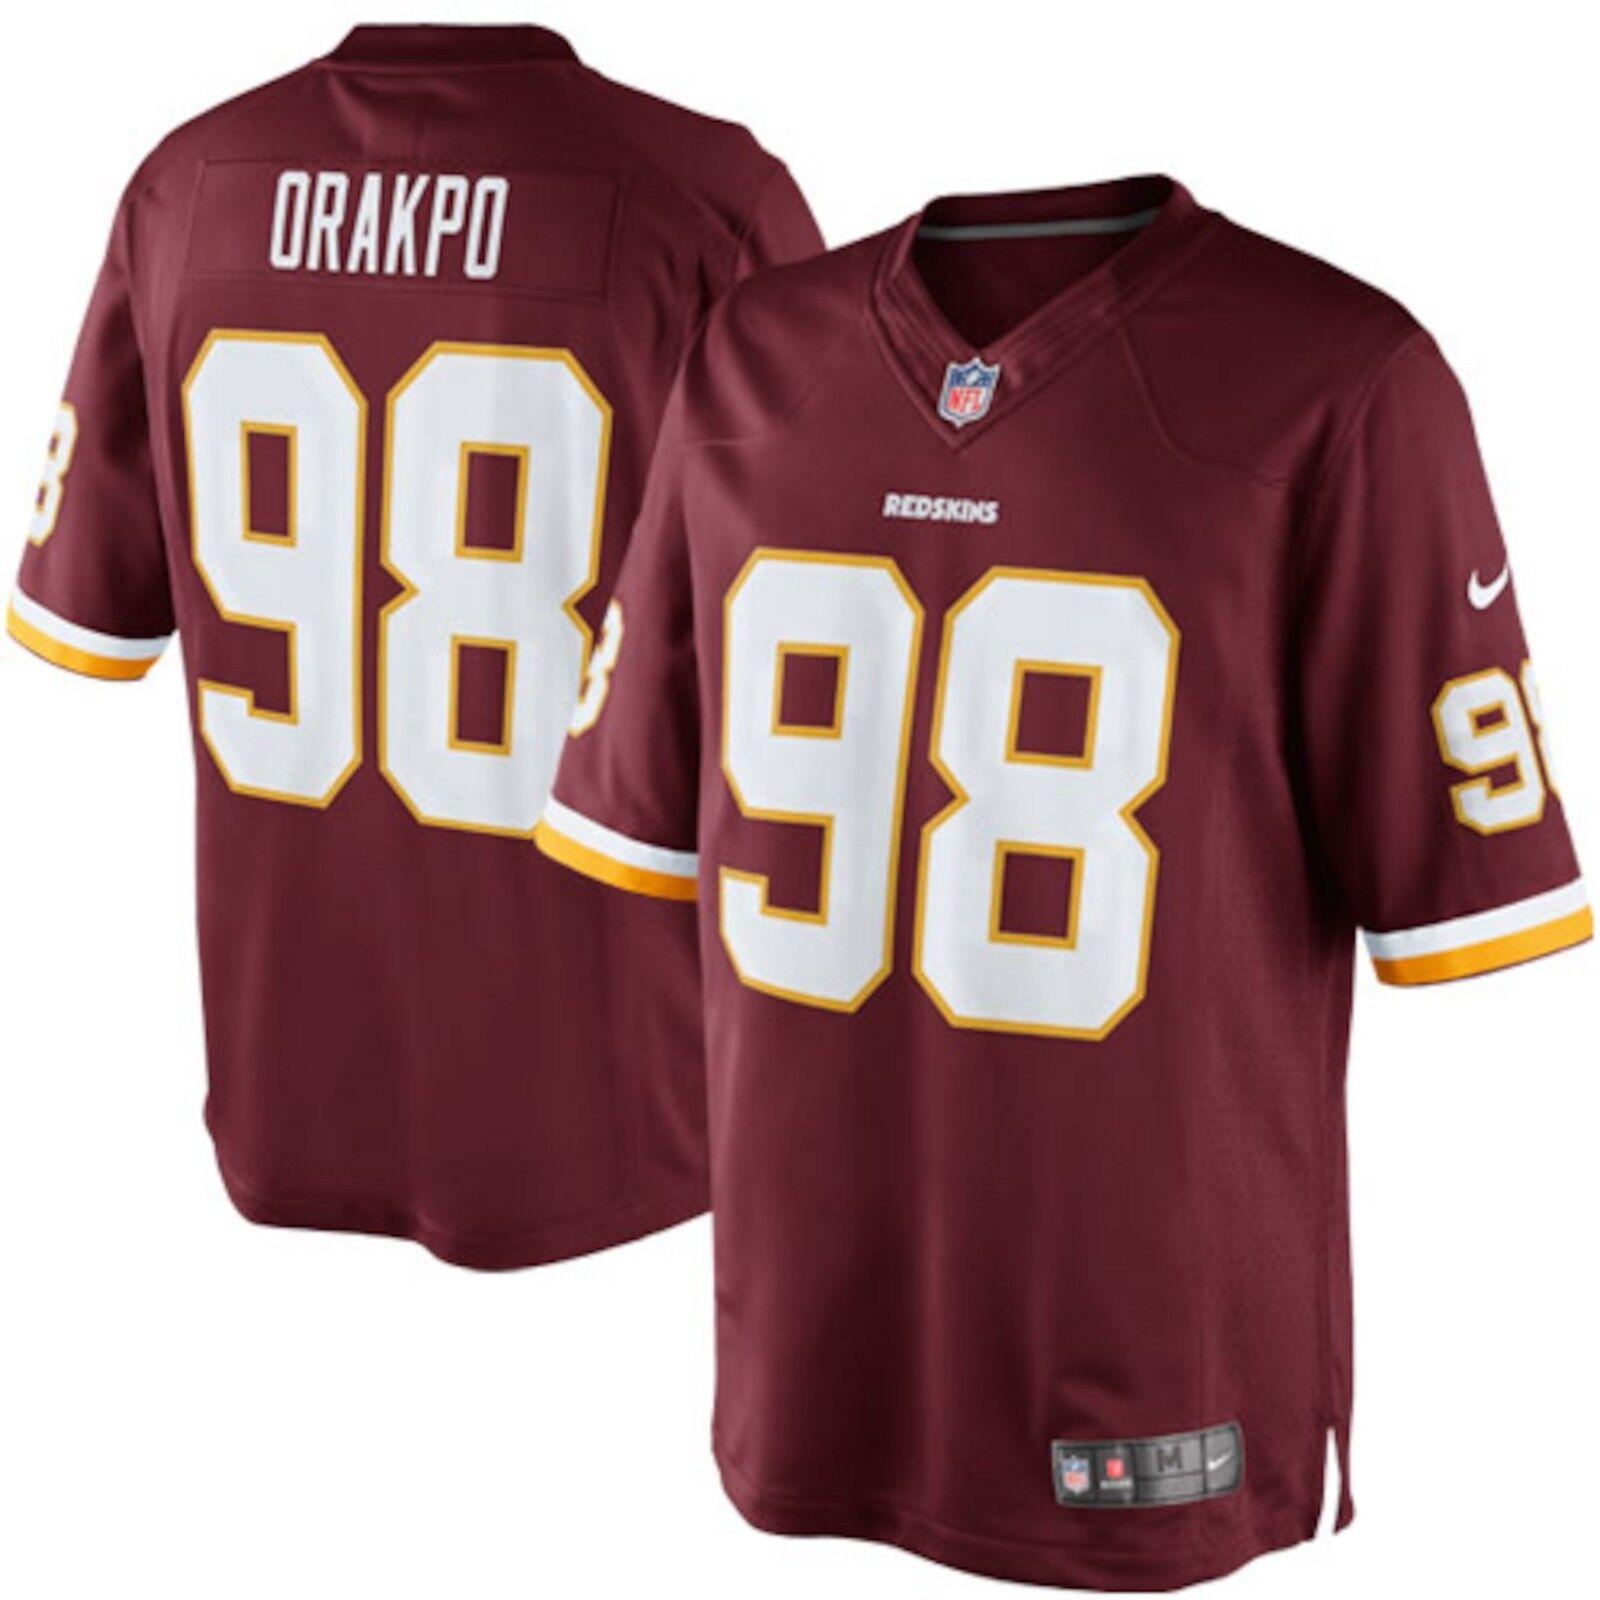 NFL Washington Redskins Men's Brian Orakpo Large Onfield Jersey NWT